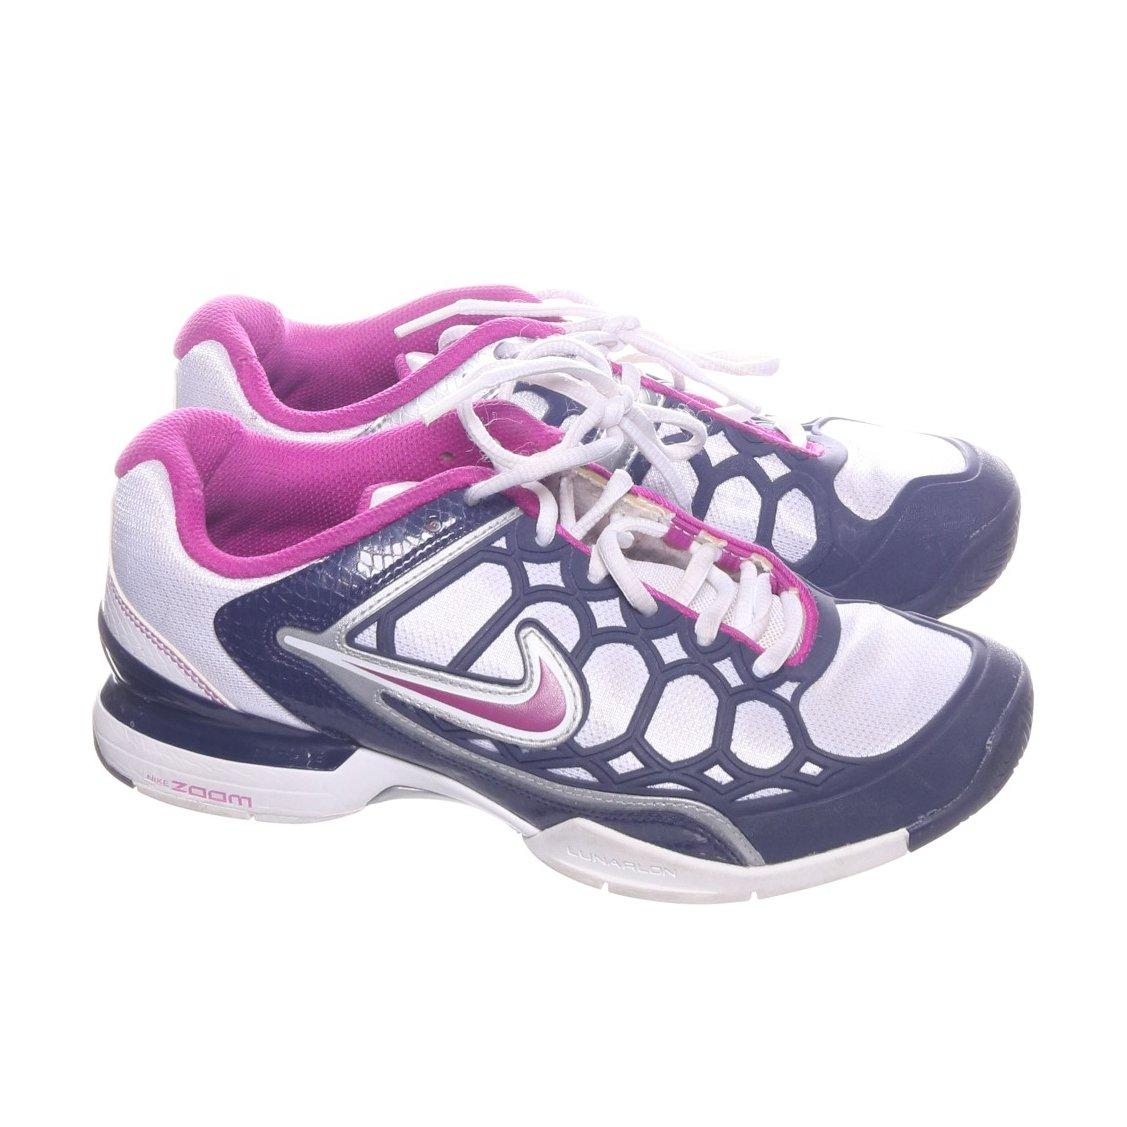 size 40 0de00 4e506 Nike, Löparskor, Strl  38, 454126-101, Vit Lila